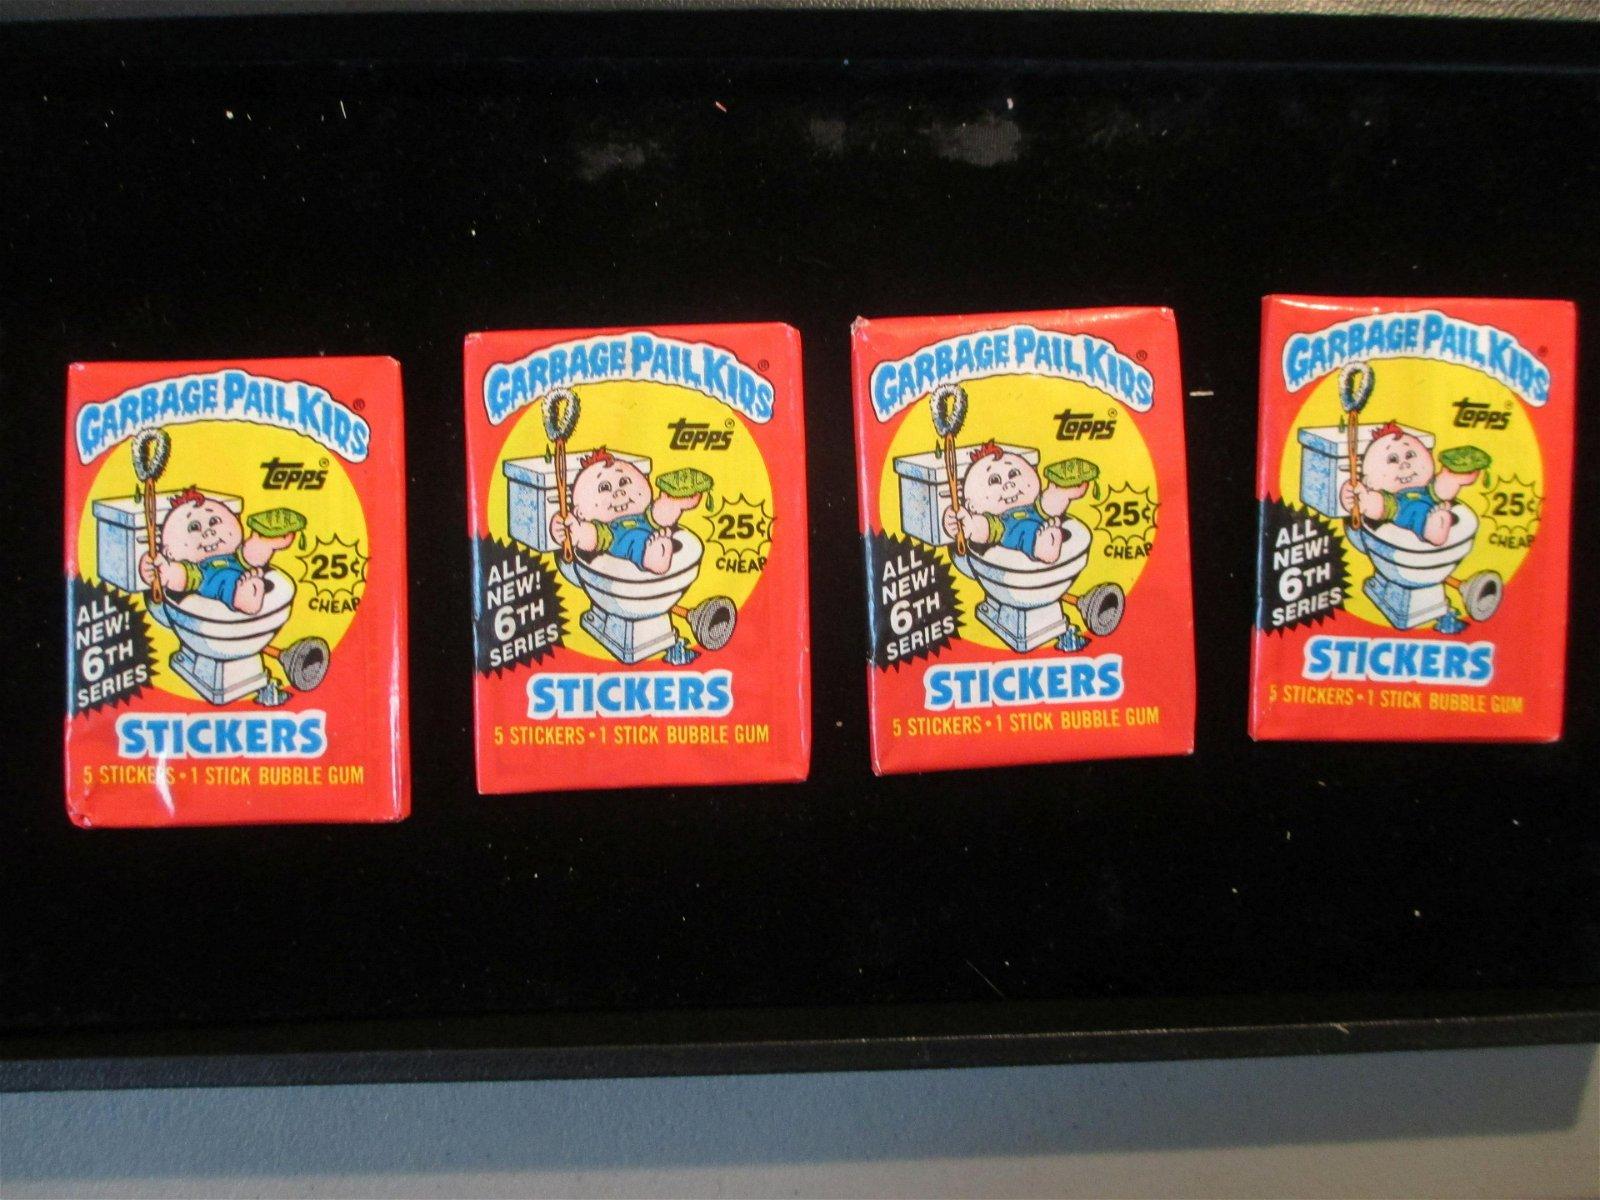 lot of 4 vintage garbage pail kids cards unopened packs